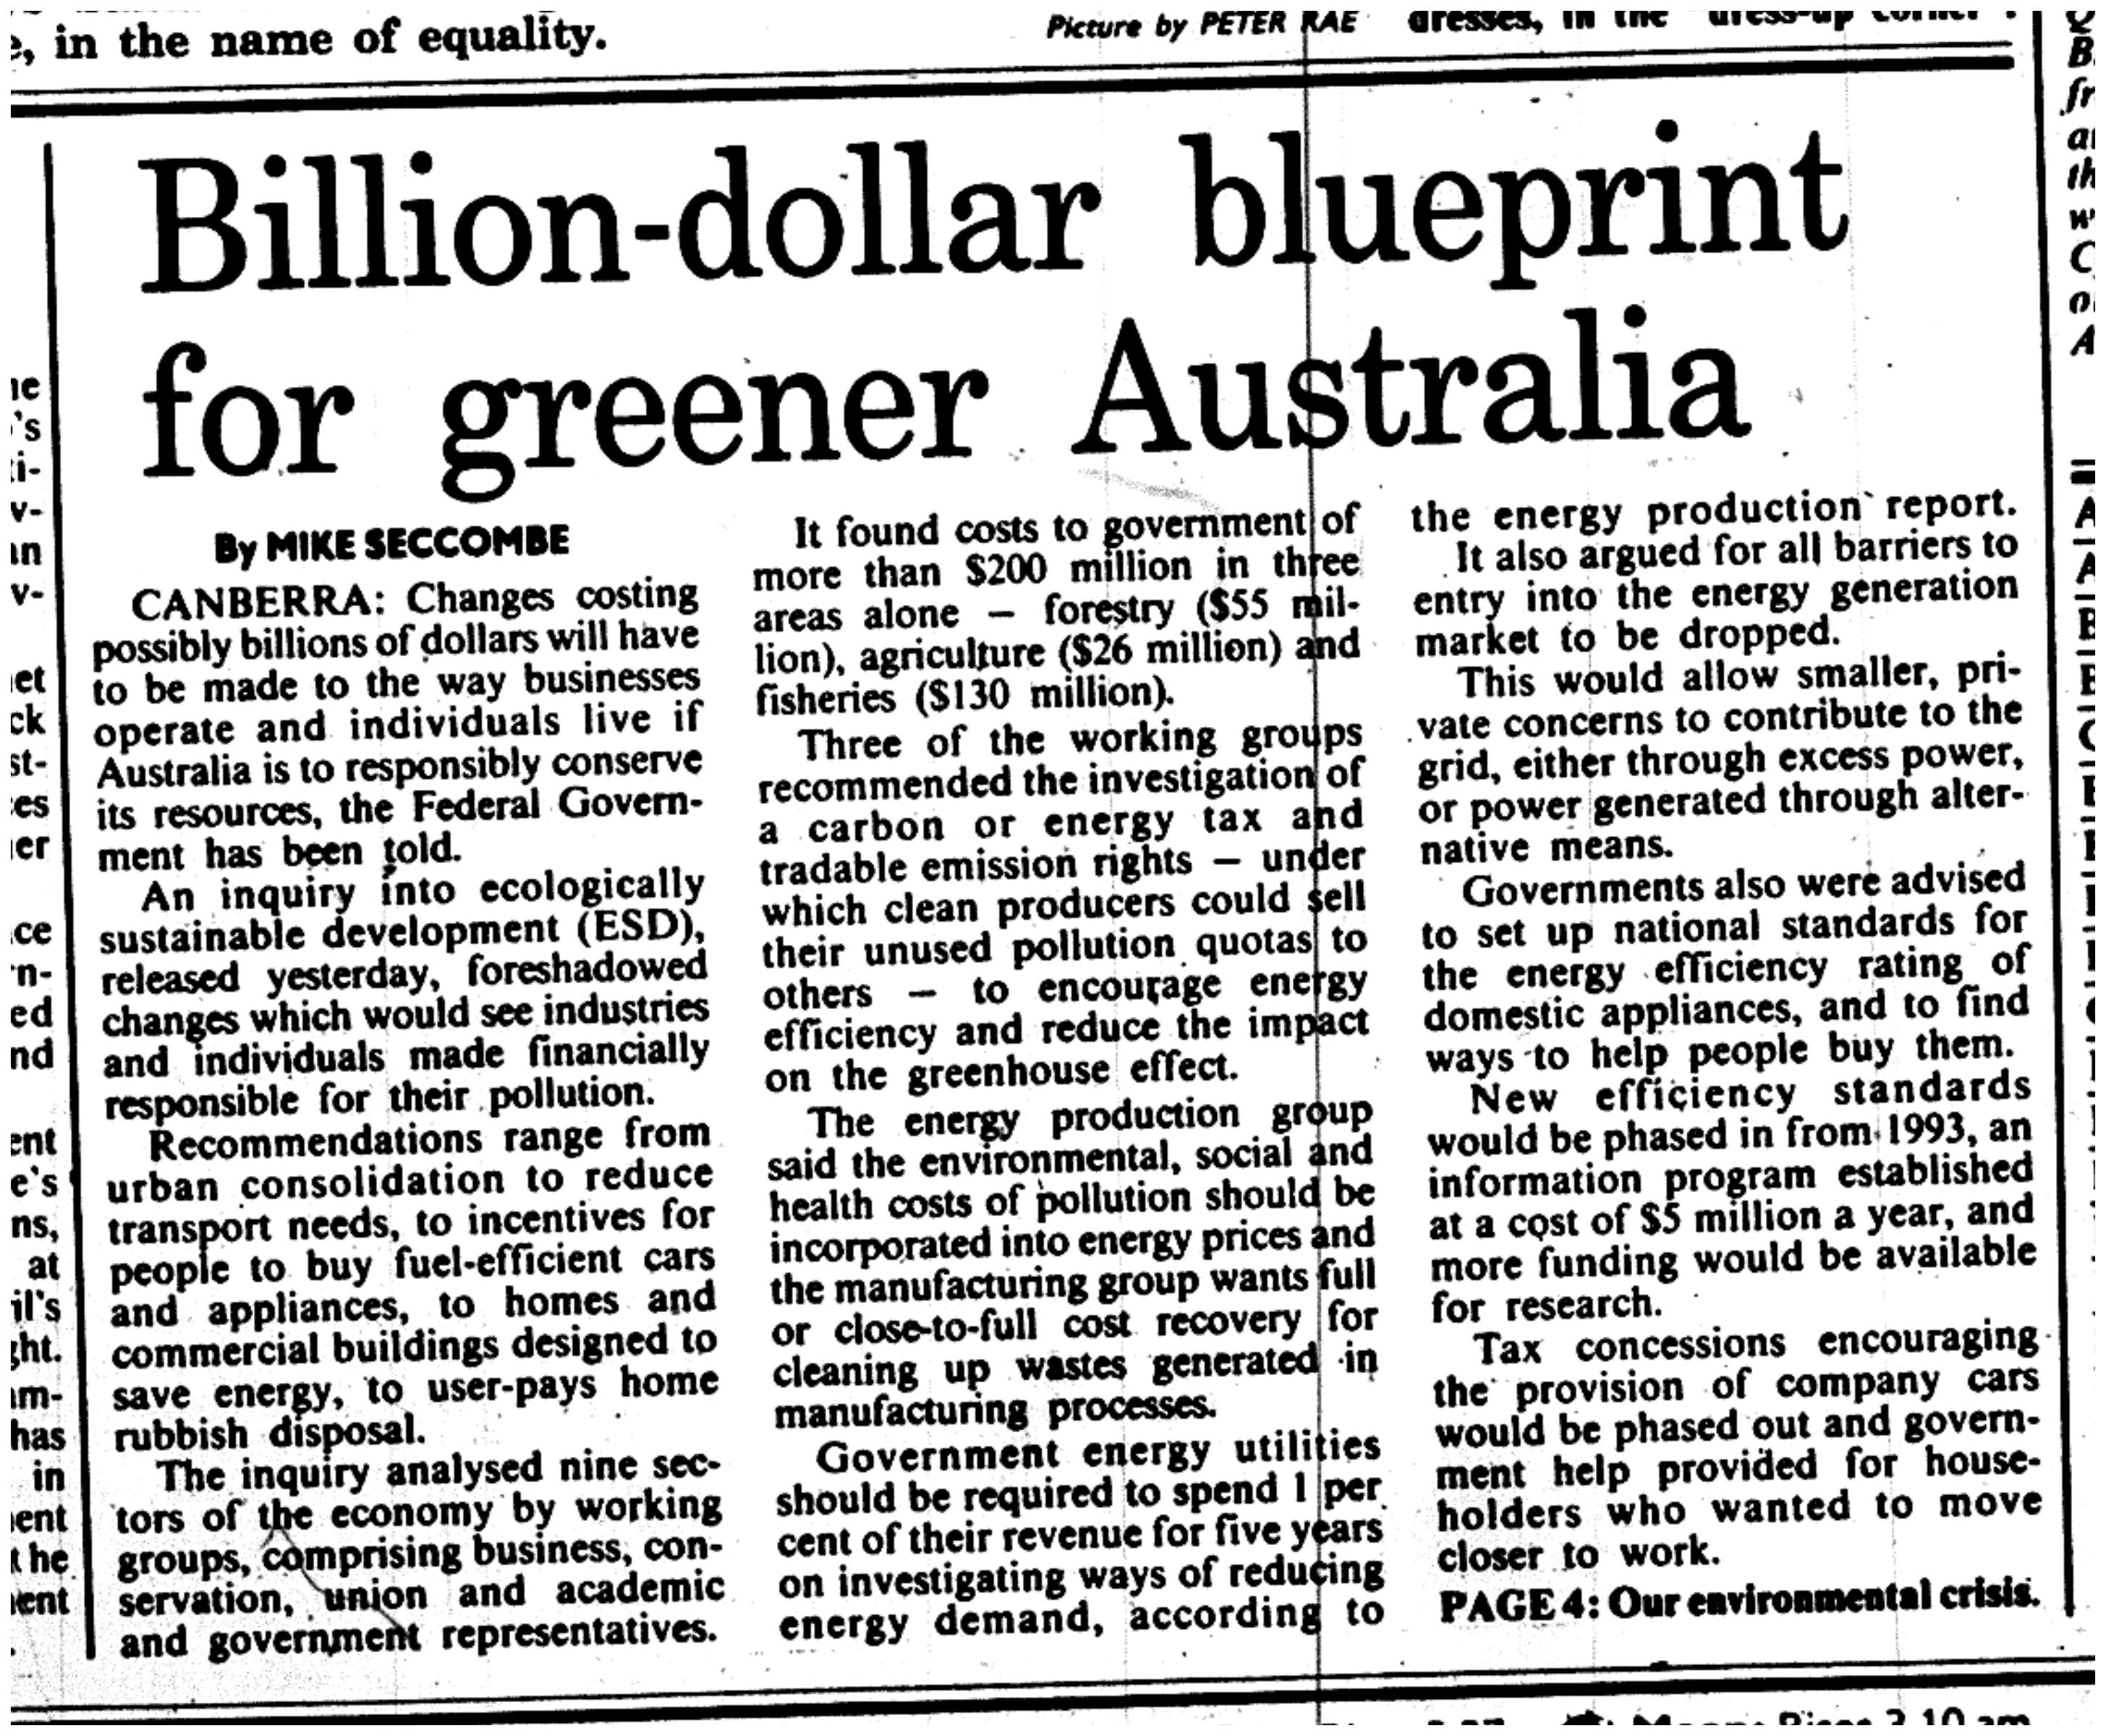 1991 12 03 blueprint for greener oz smh1.png